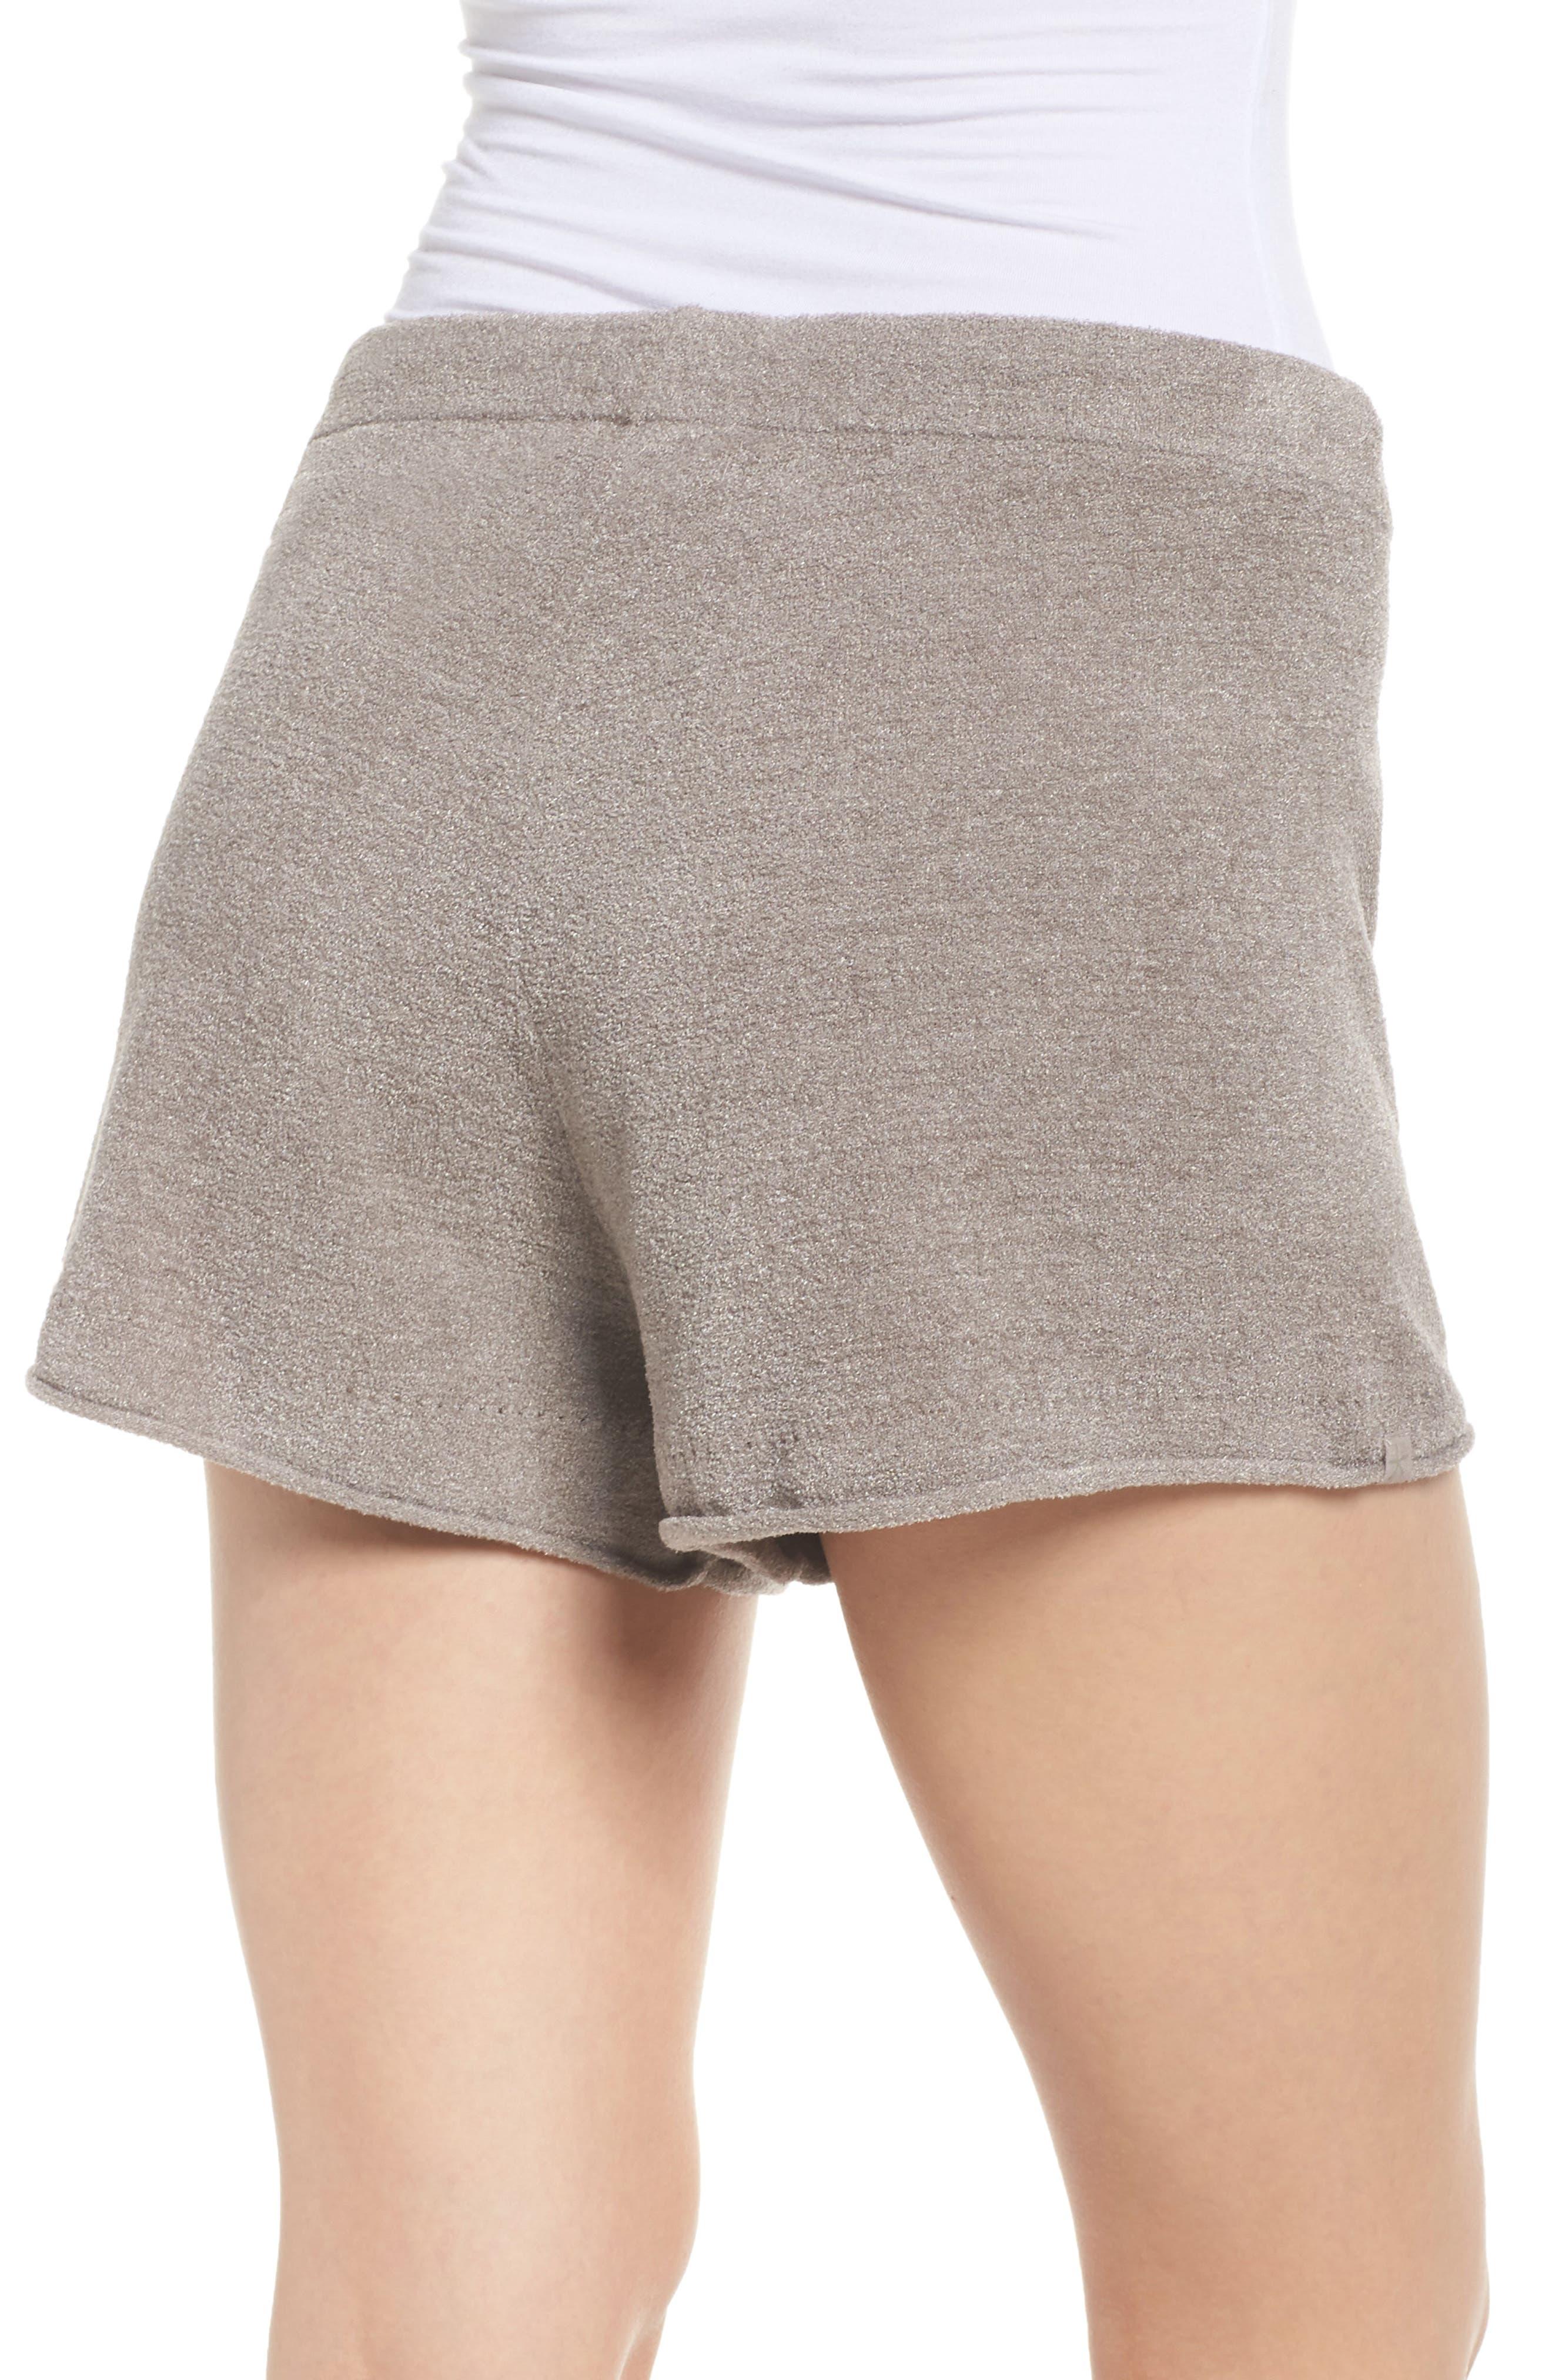 CozyChic Ultra Lite<sup>®</sup> Lounge Shorts,                             Alternate thumbnail 2, color,                             Beach Rock